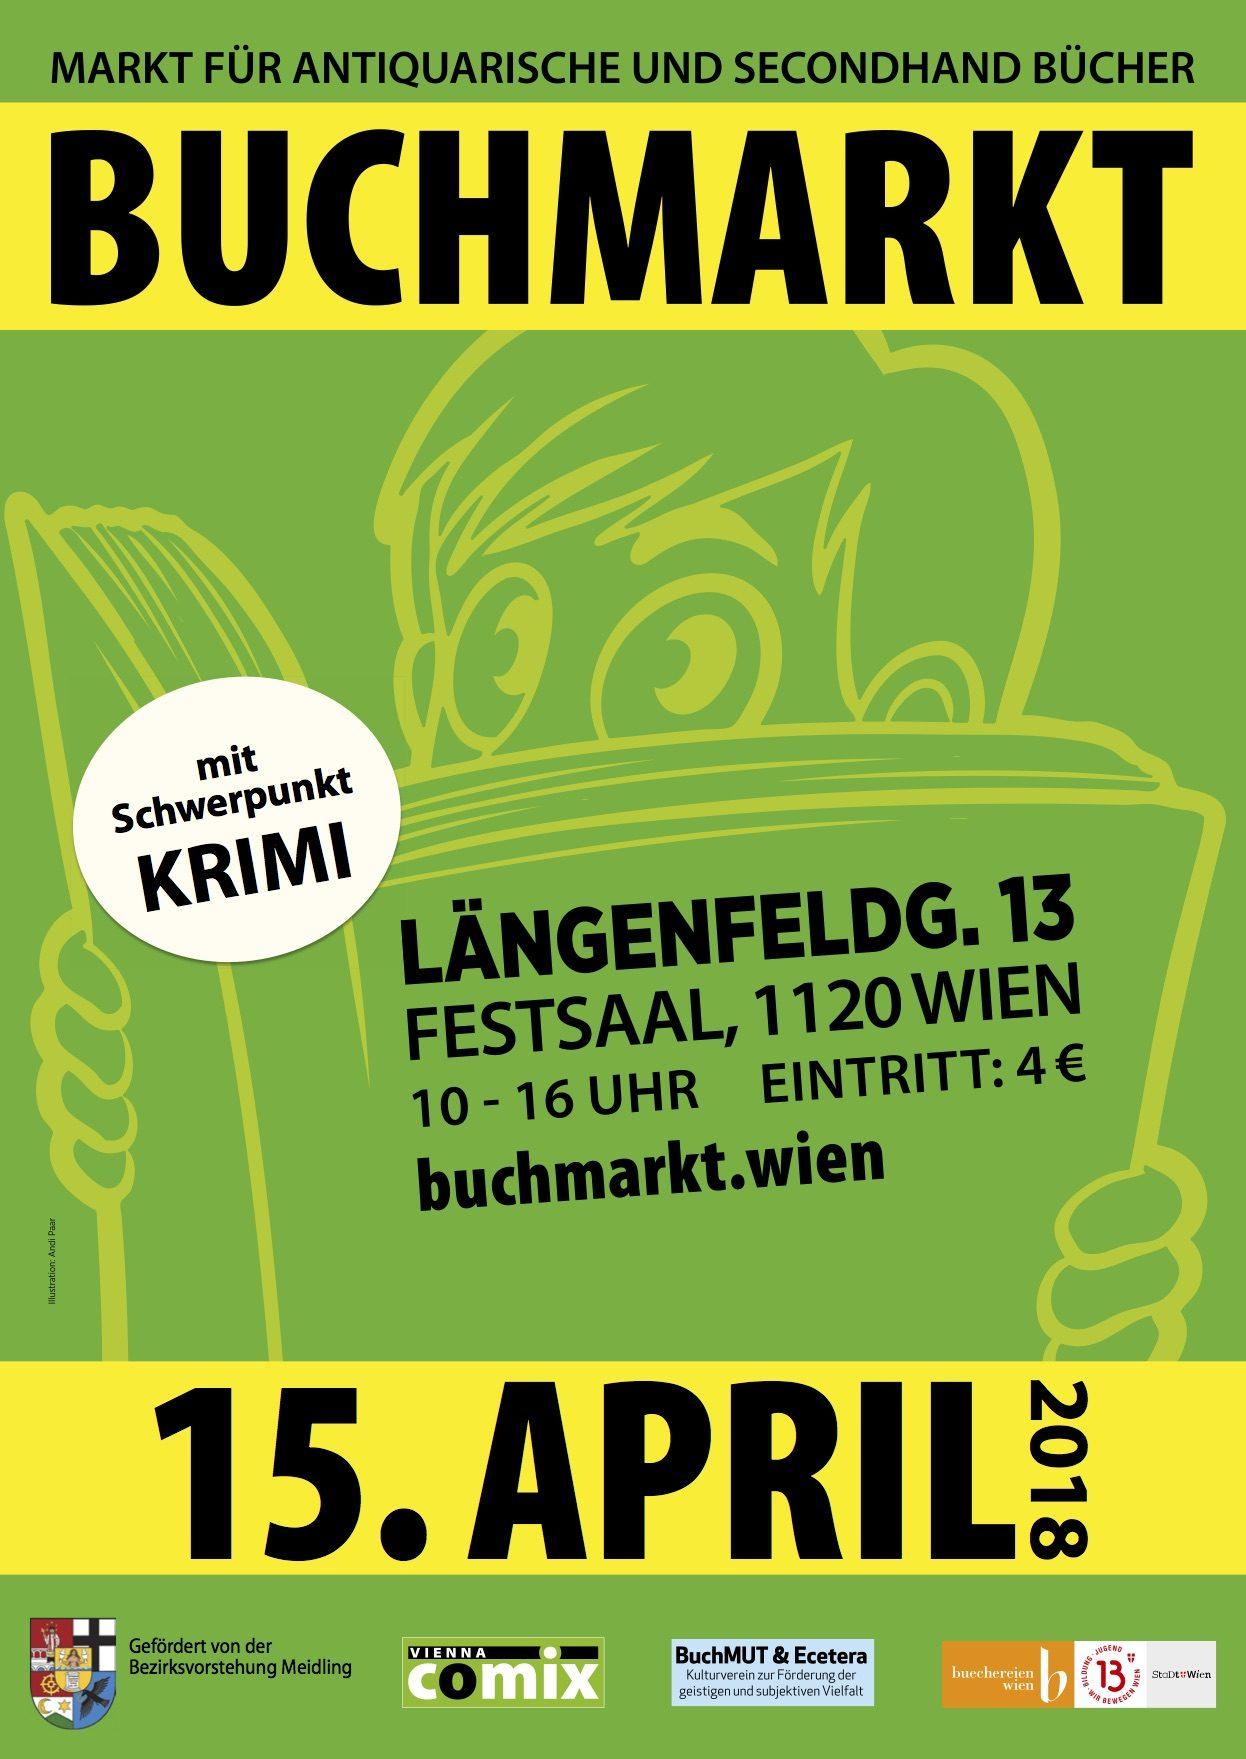 BuchMarkt Wien 15.4.17